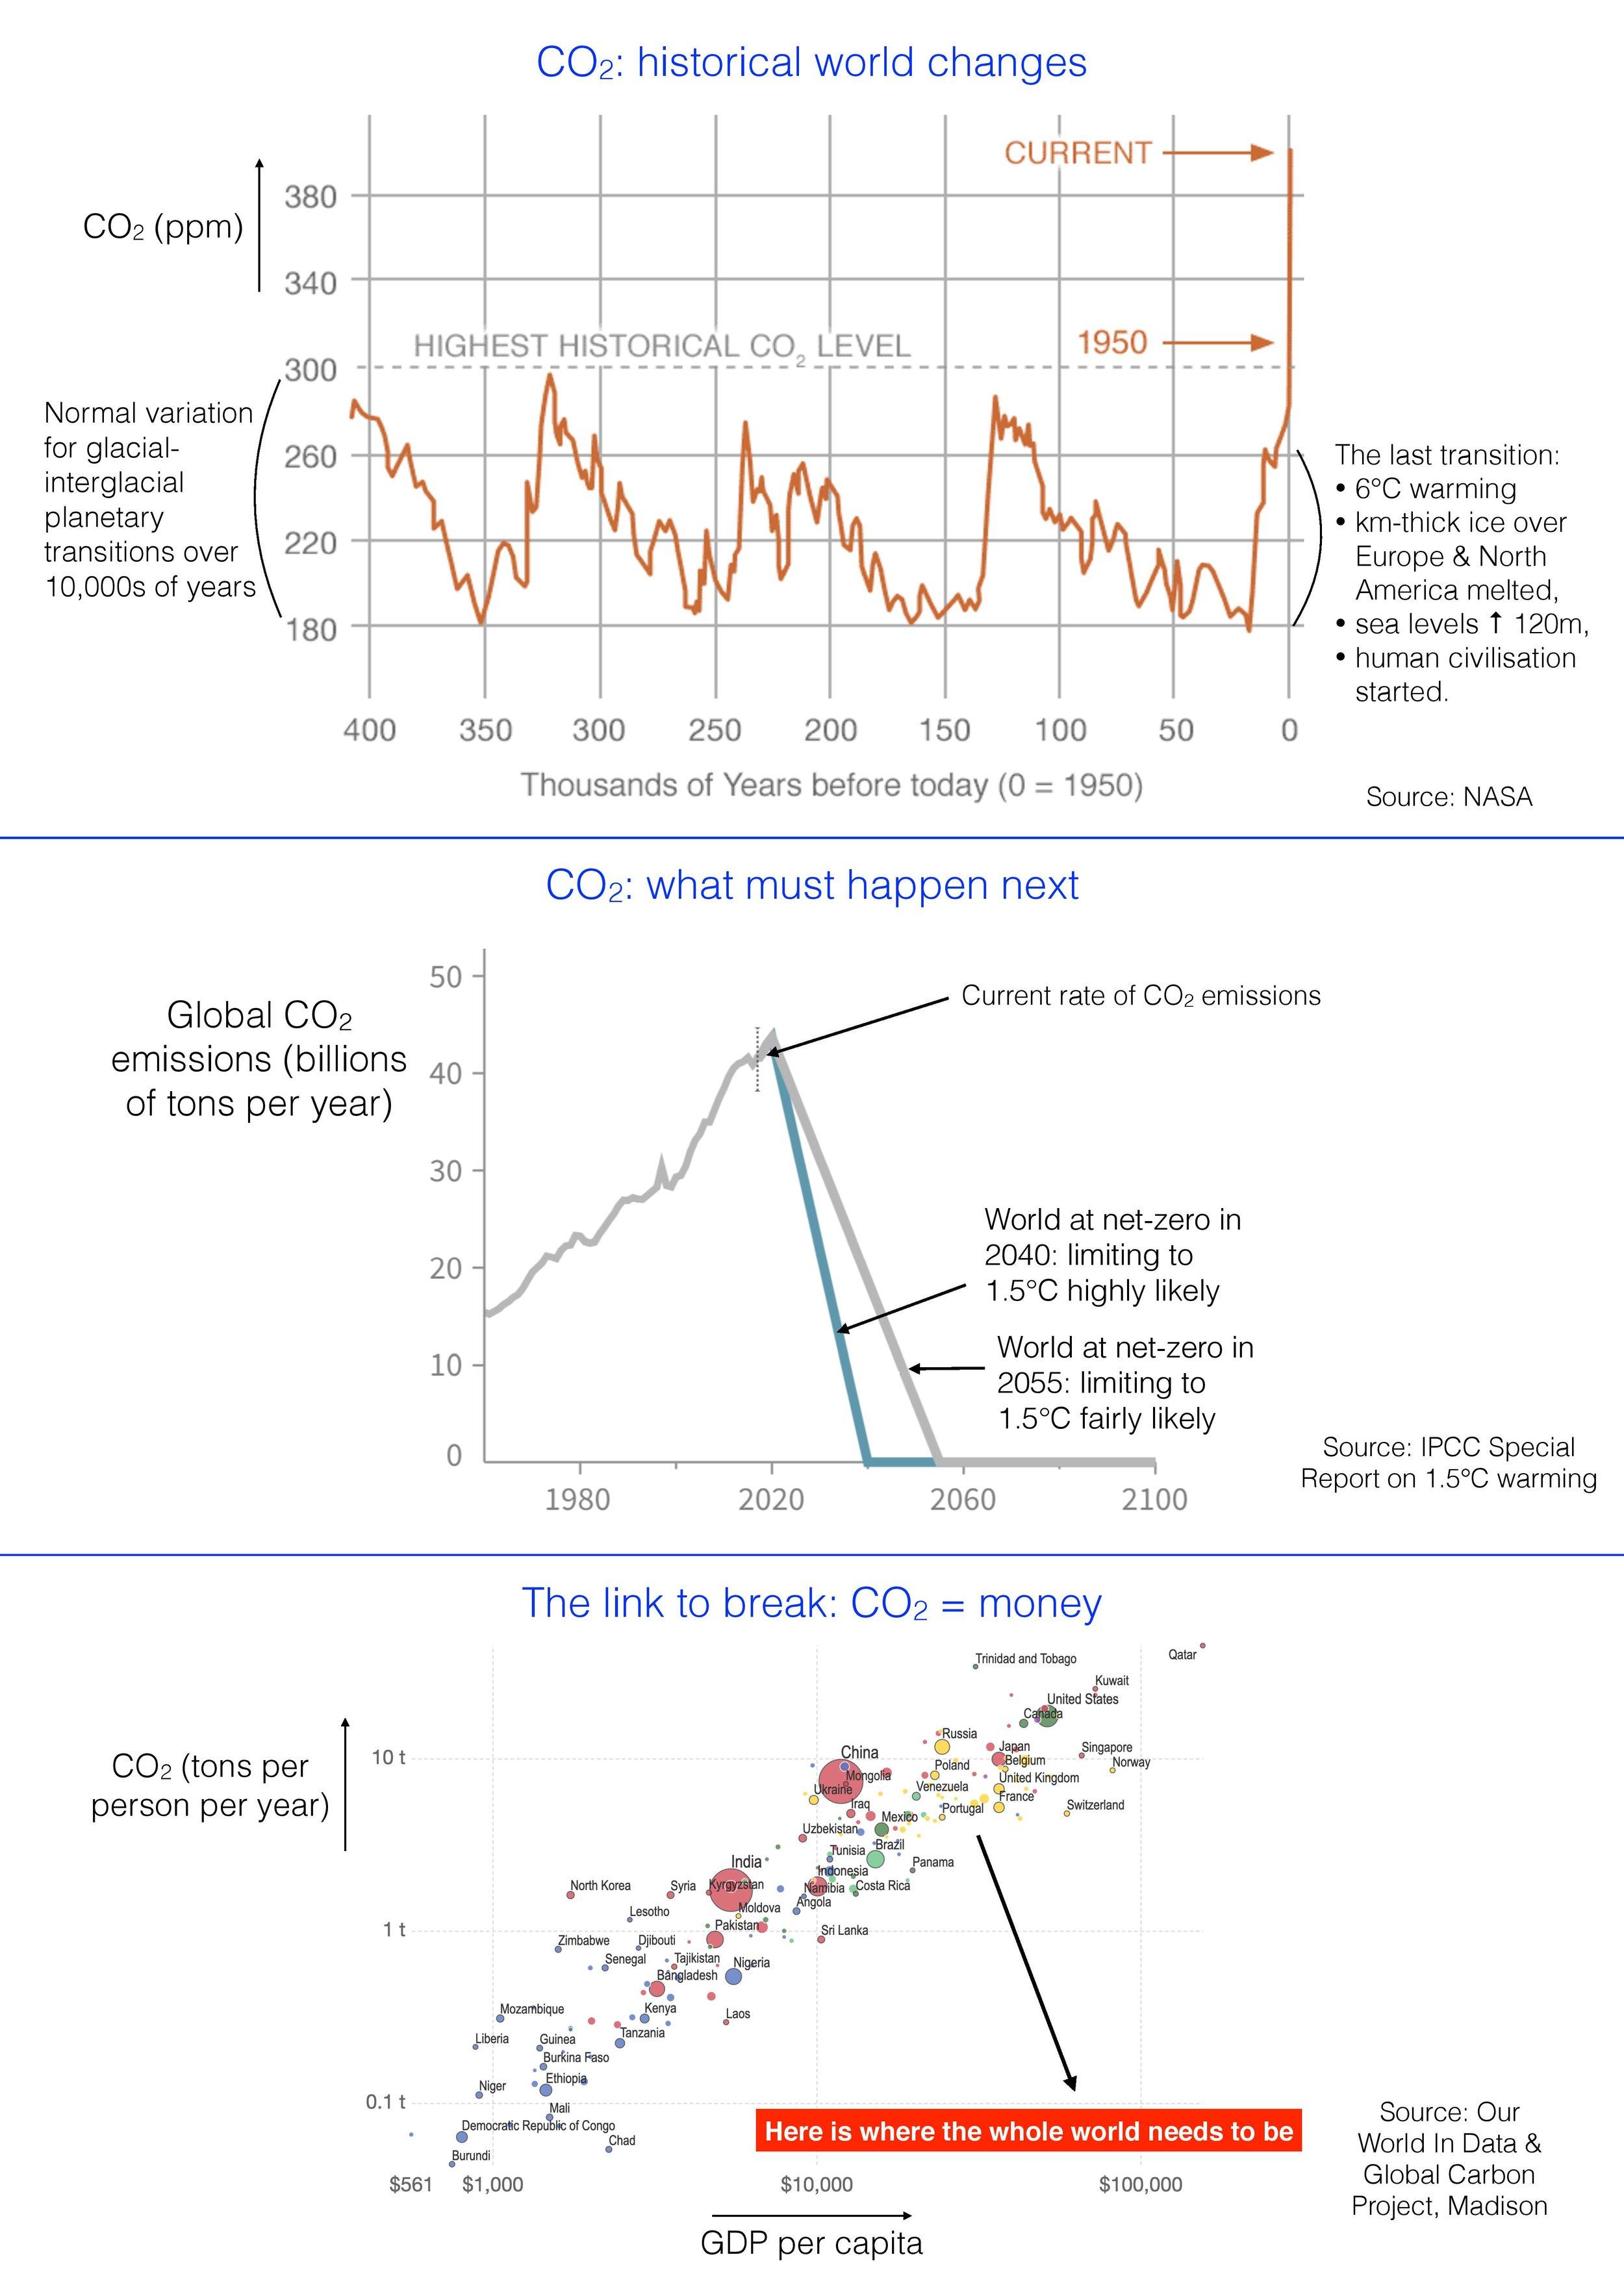 ClimateChangePoster.jpg